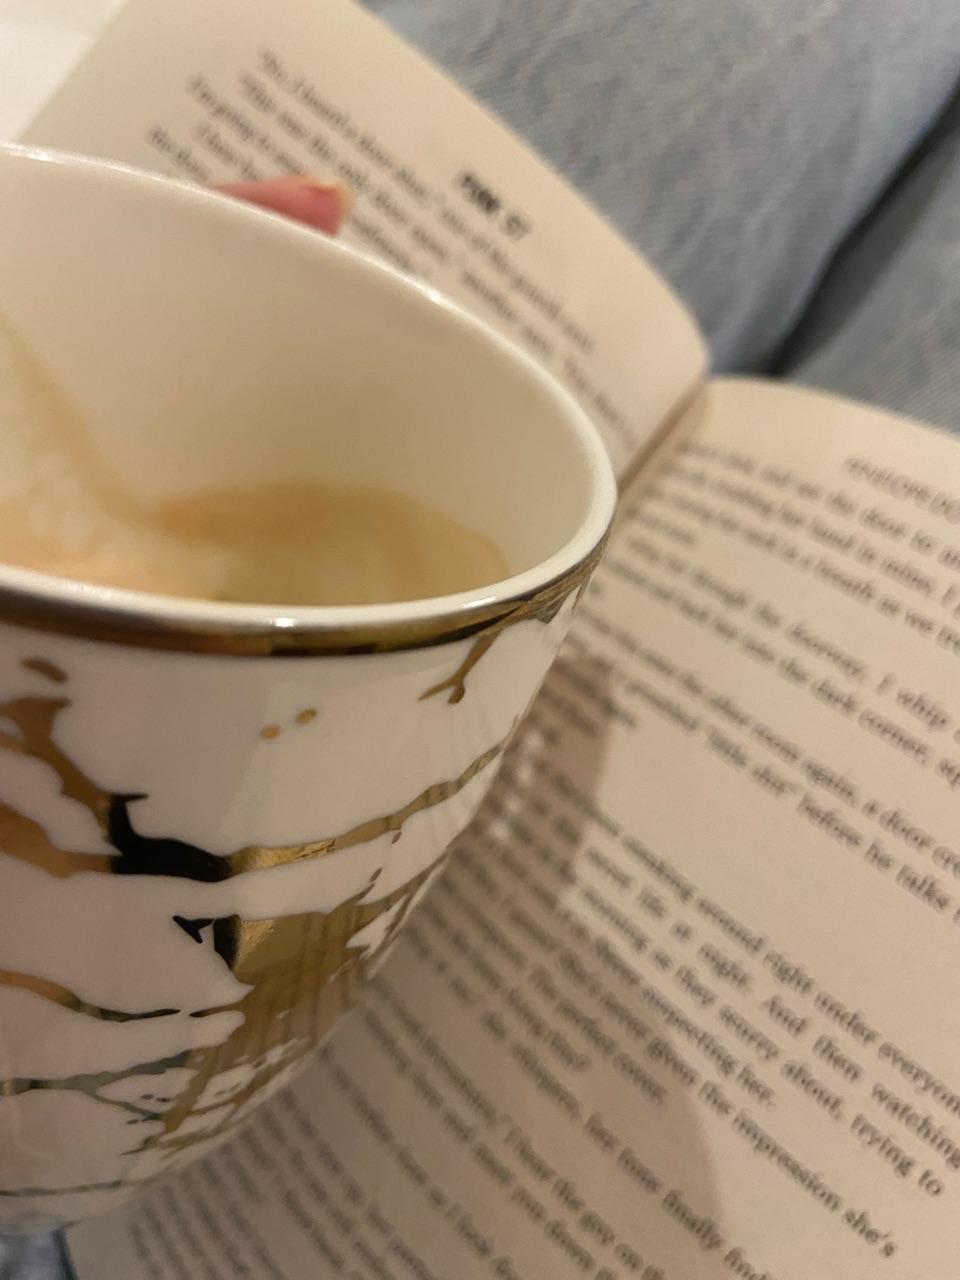 books, inspirama, and bookworm image